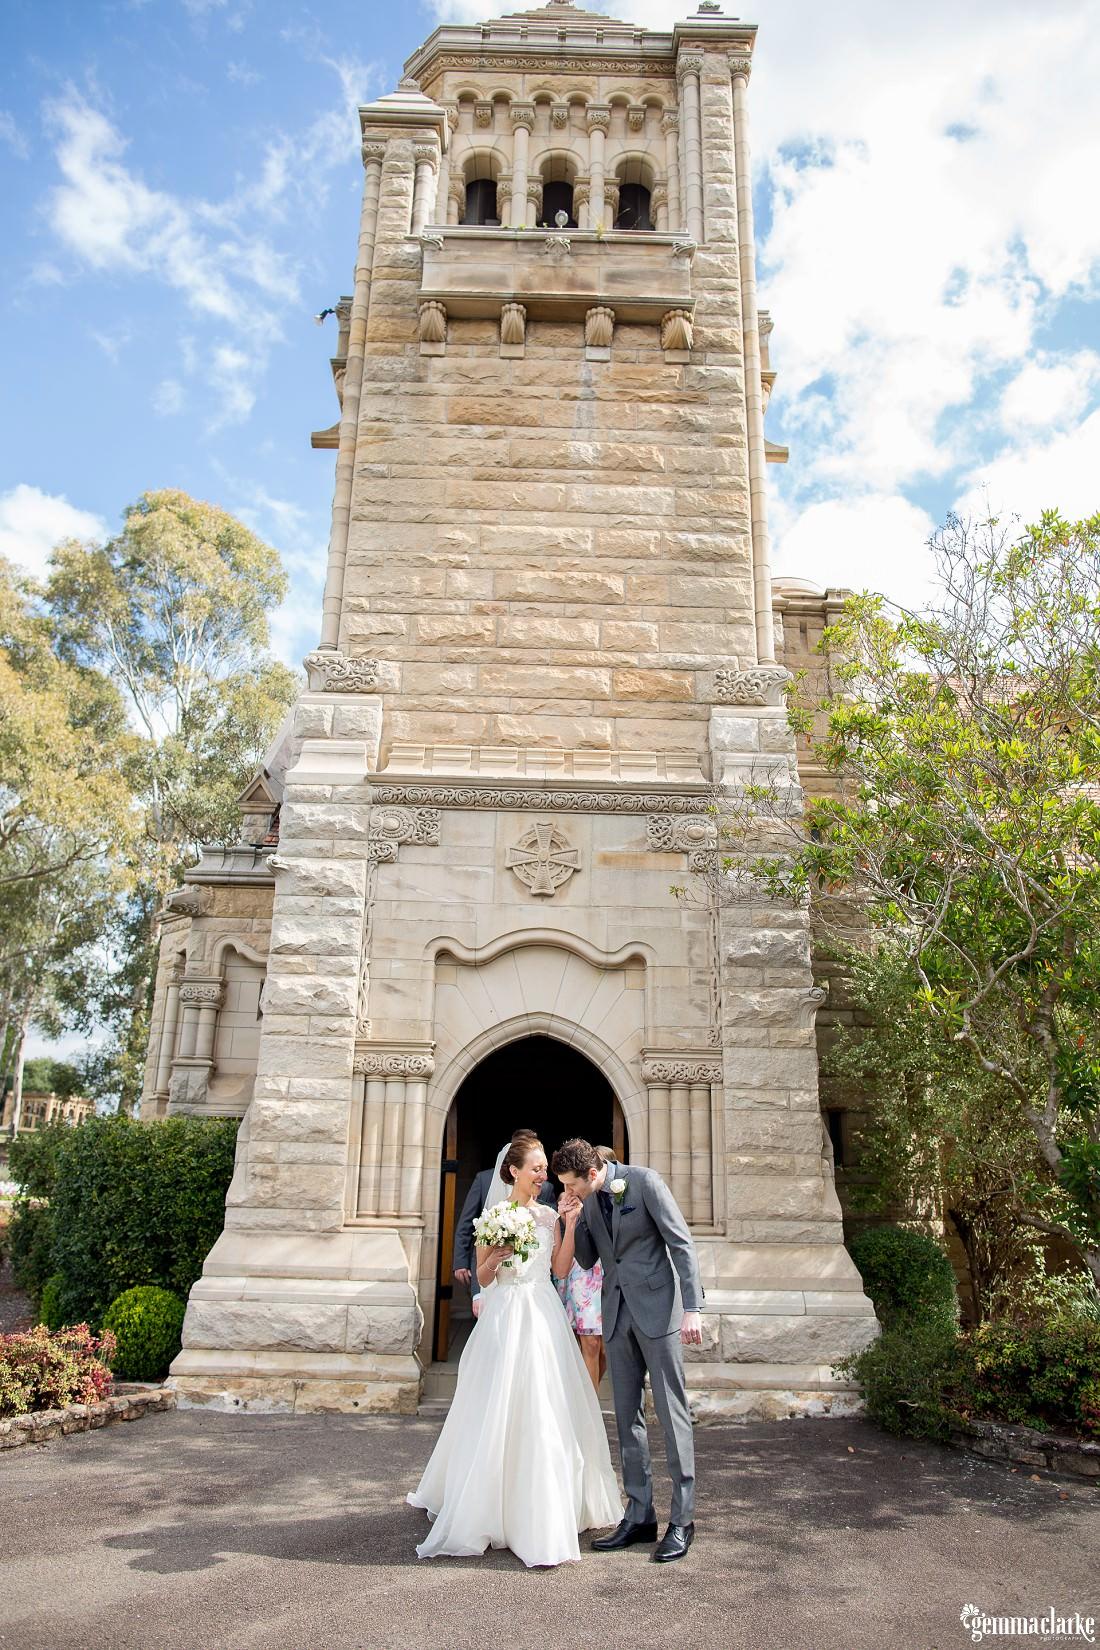 gemma-clarke-photography_kings-school-wedding_balmoral-beach-reception_bathers-pavilion-wedding_luisa-and-nick_0033